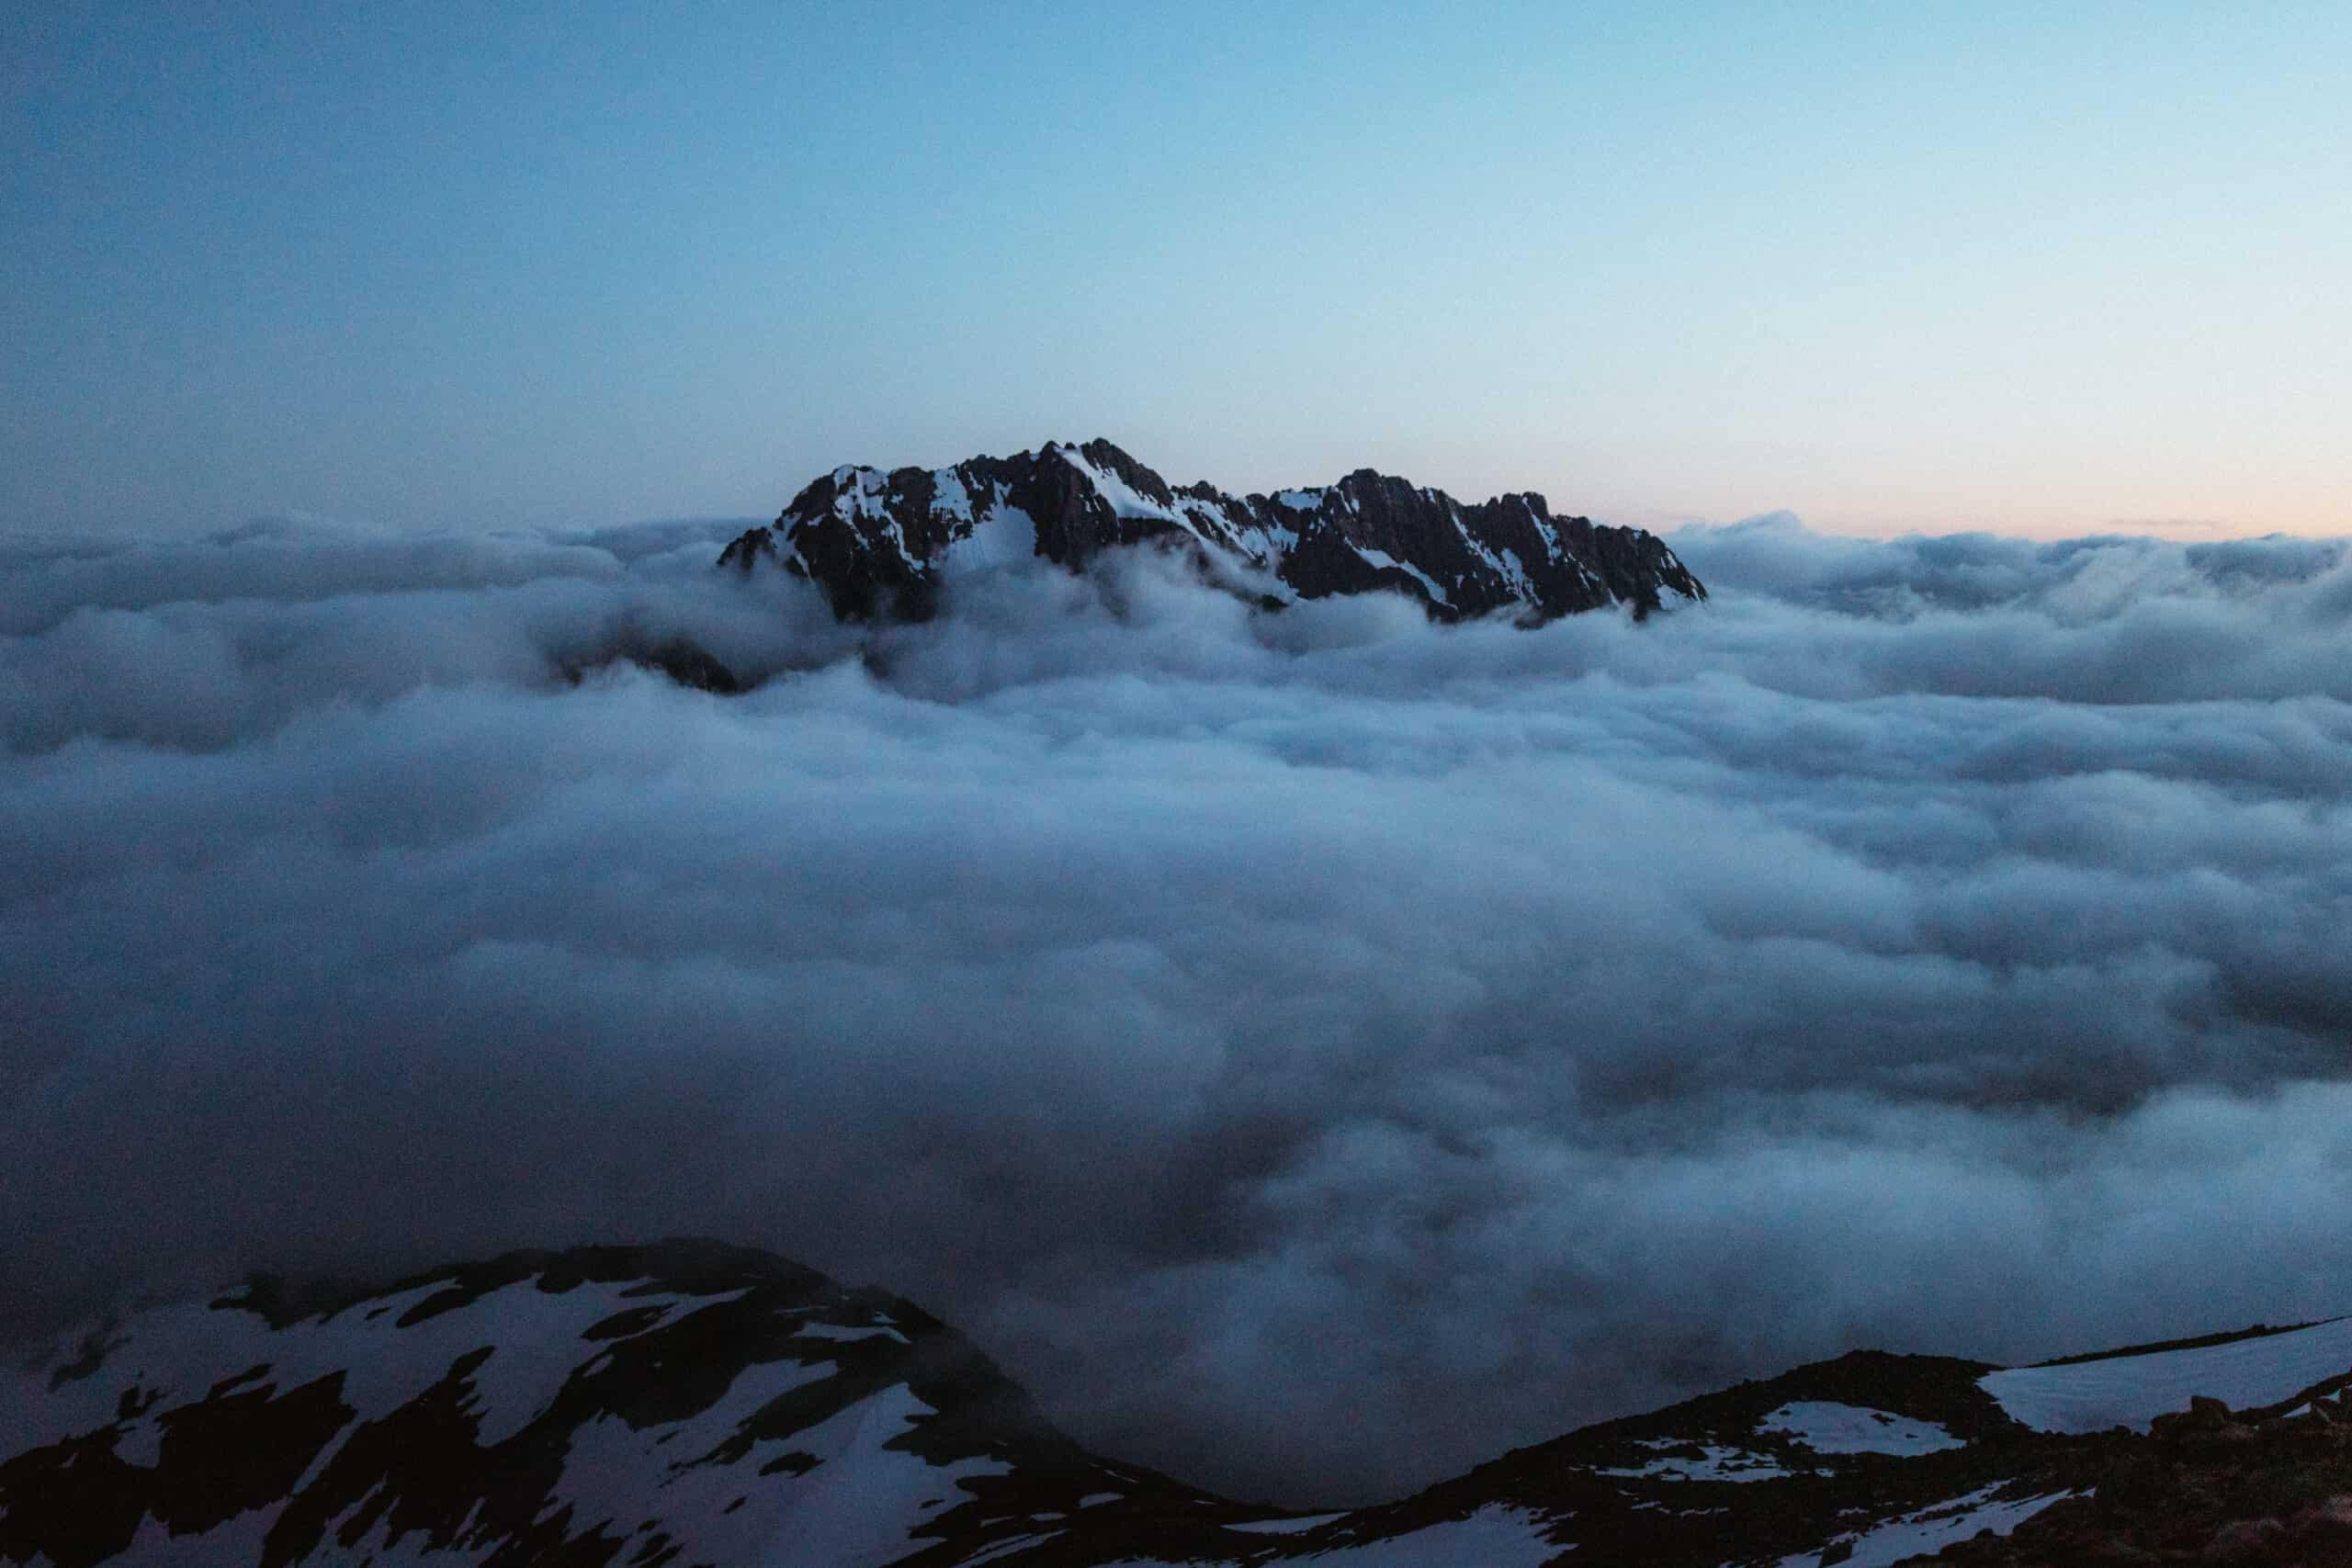 Cloud inversion in Washington State